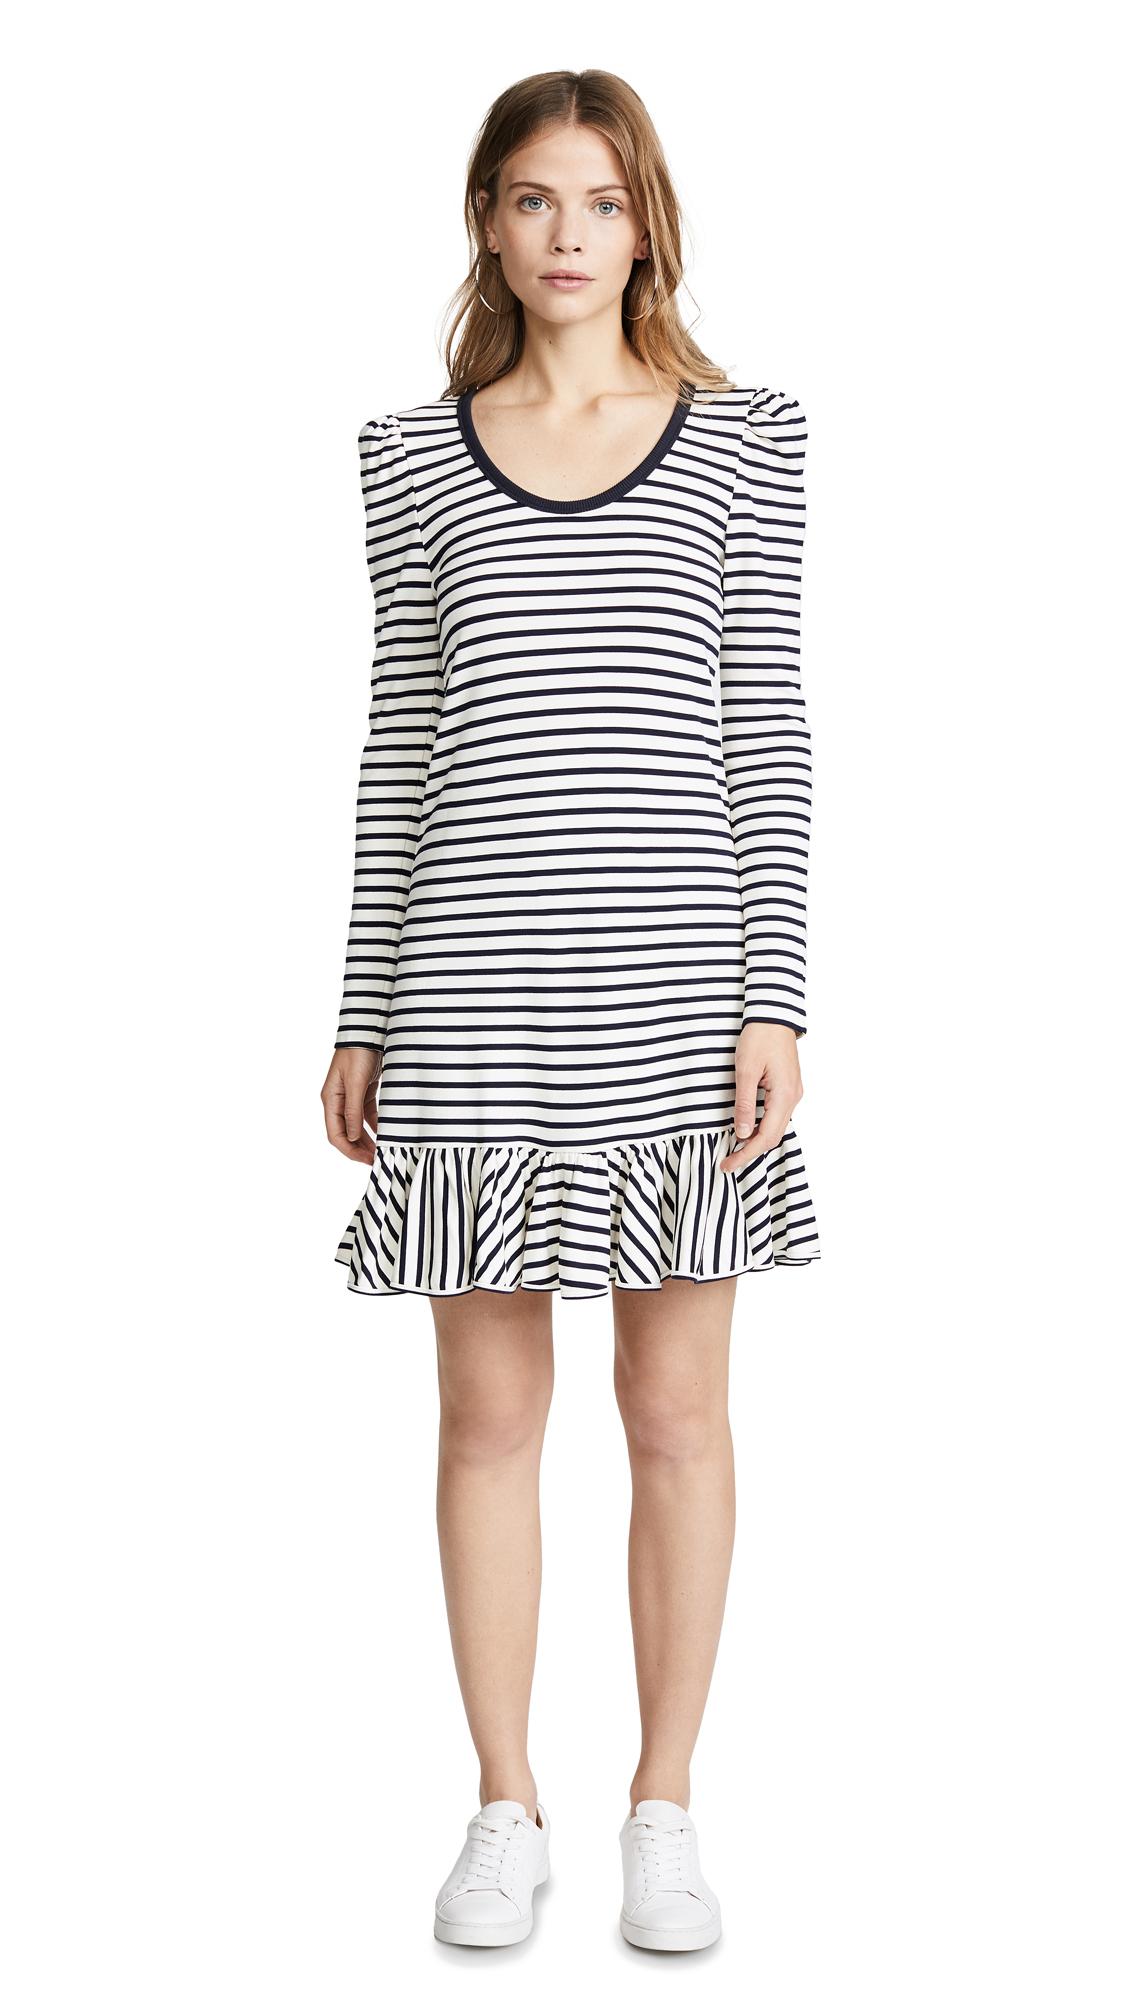 Alexis Loza Dress